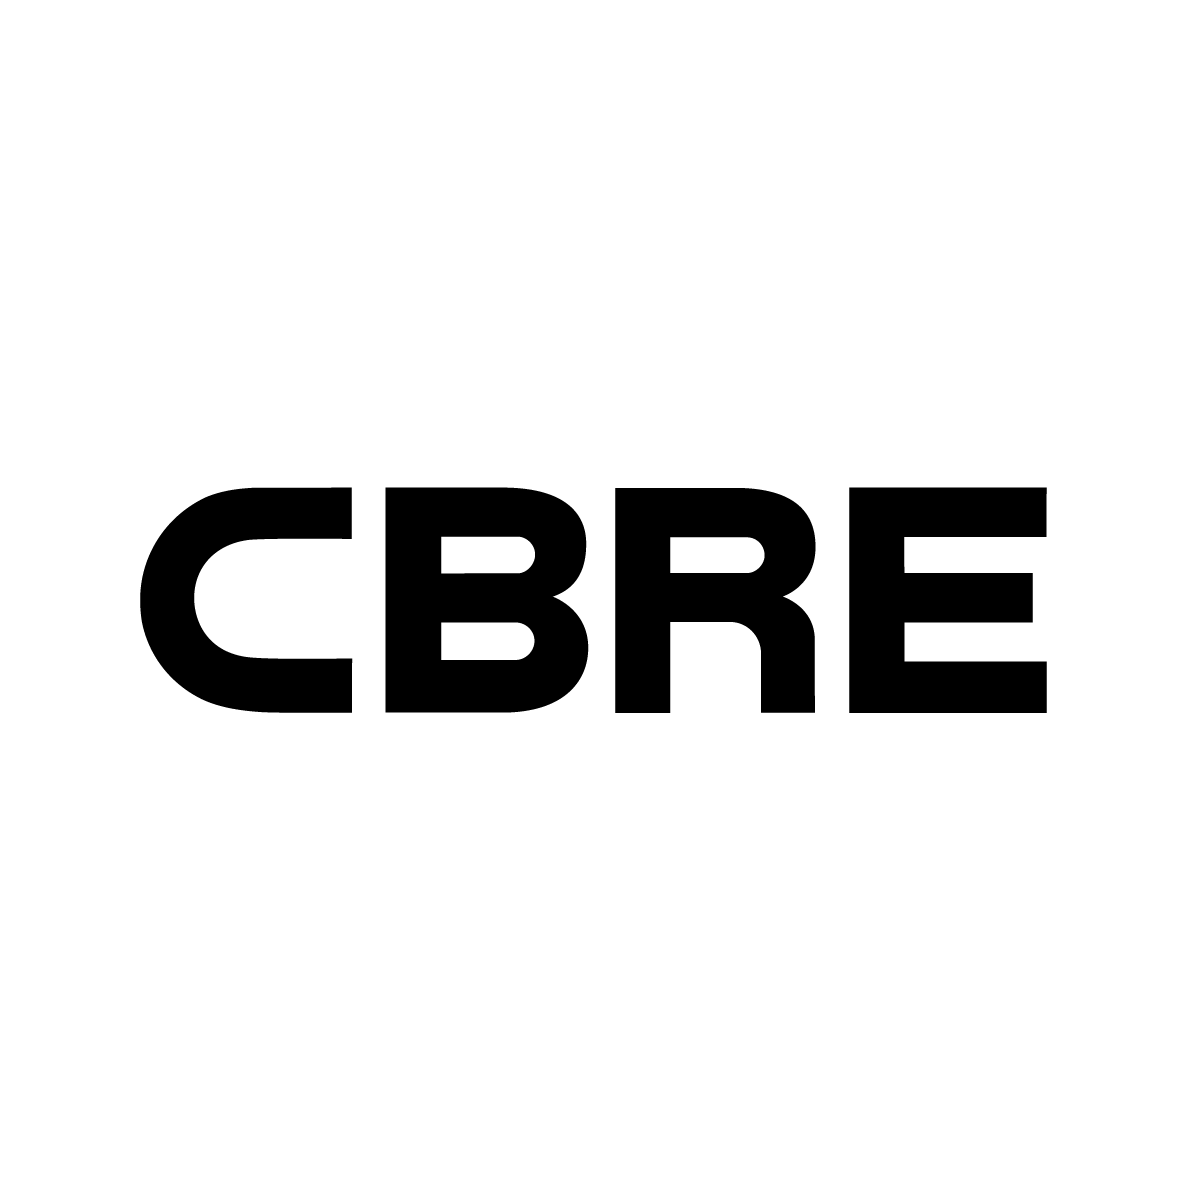 CBRE2-01.png